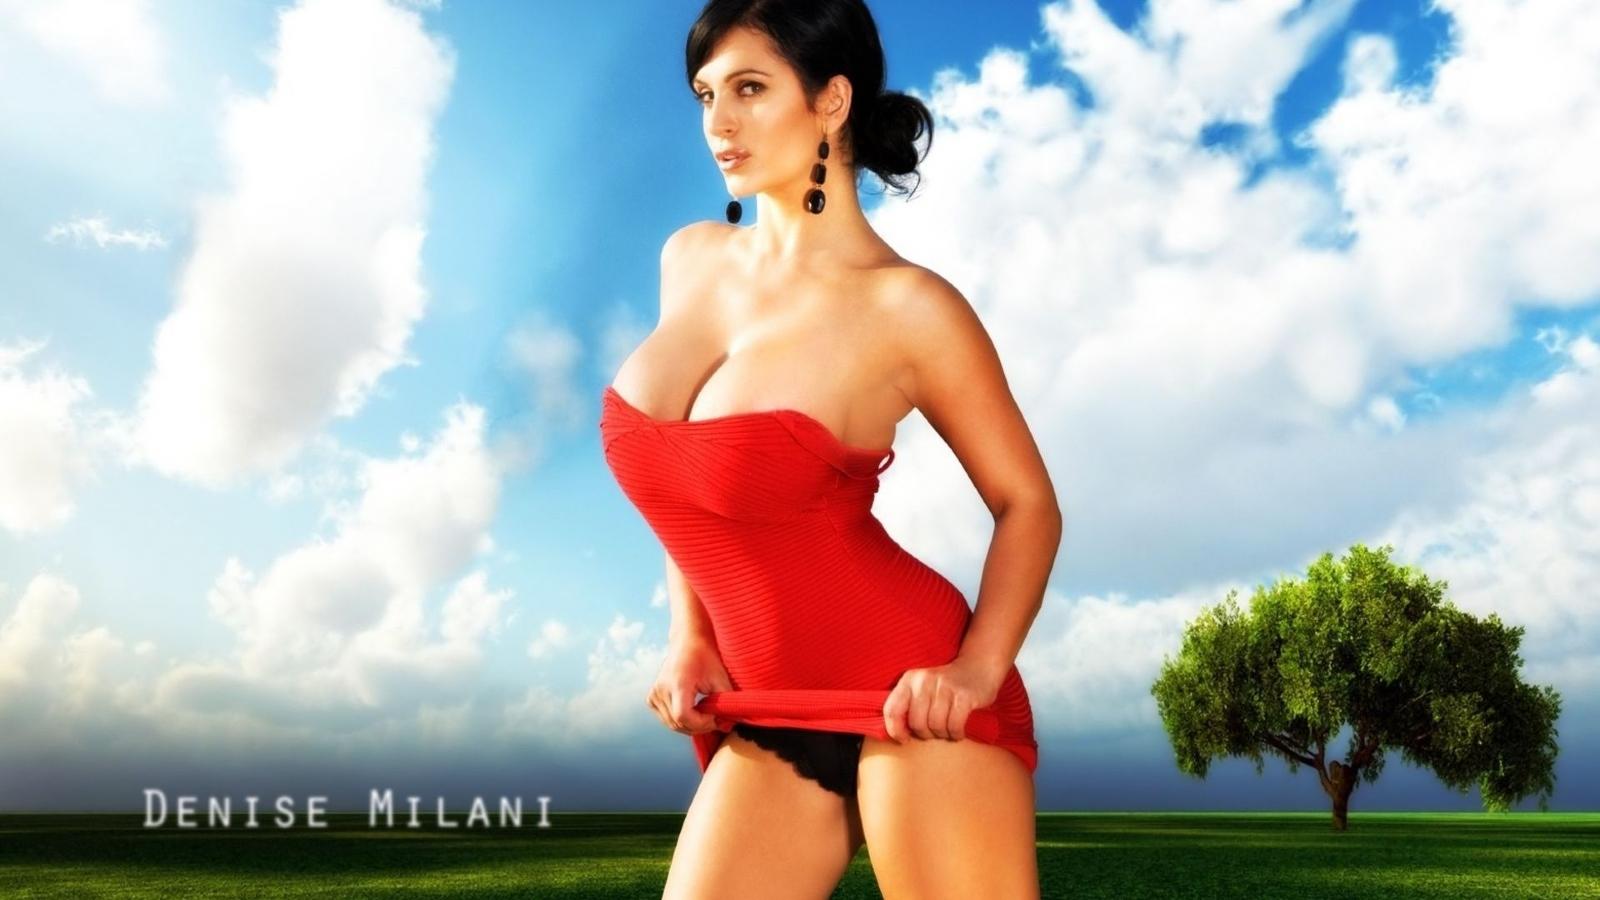 http://3.bp.blogspot.com/-mUIMcy5vsLs/UFXBl7KQYYI/AAAAAAAARTk/WYahxBXDSDI/s1600/super-denise-milani-wallpaper-hd-31.jpg